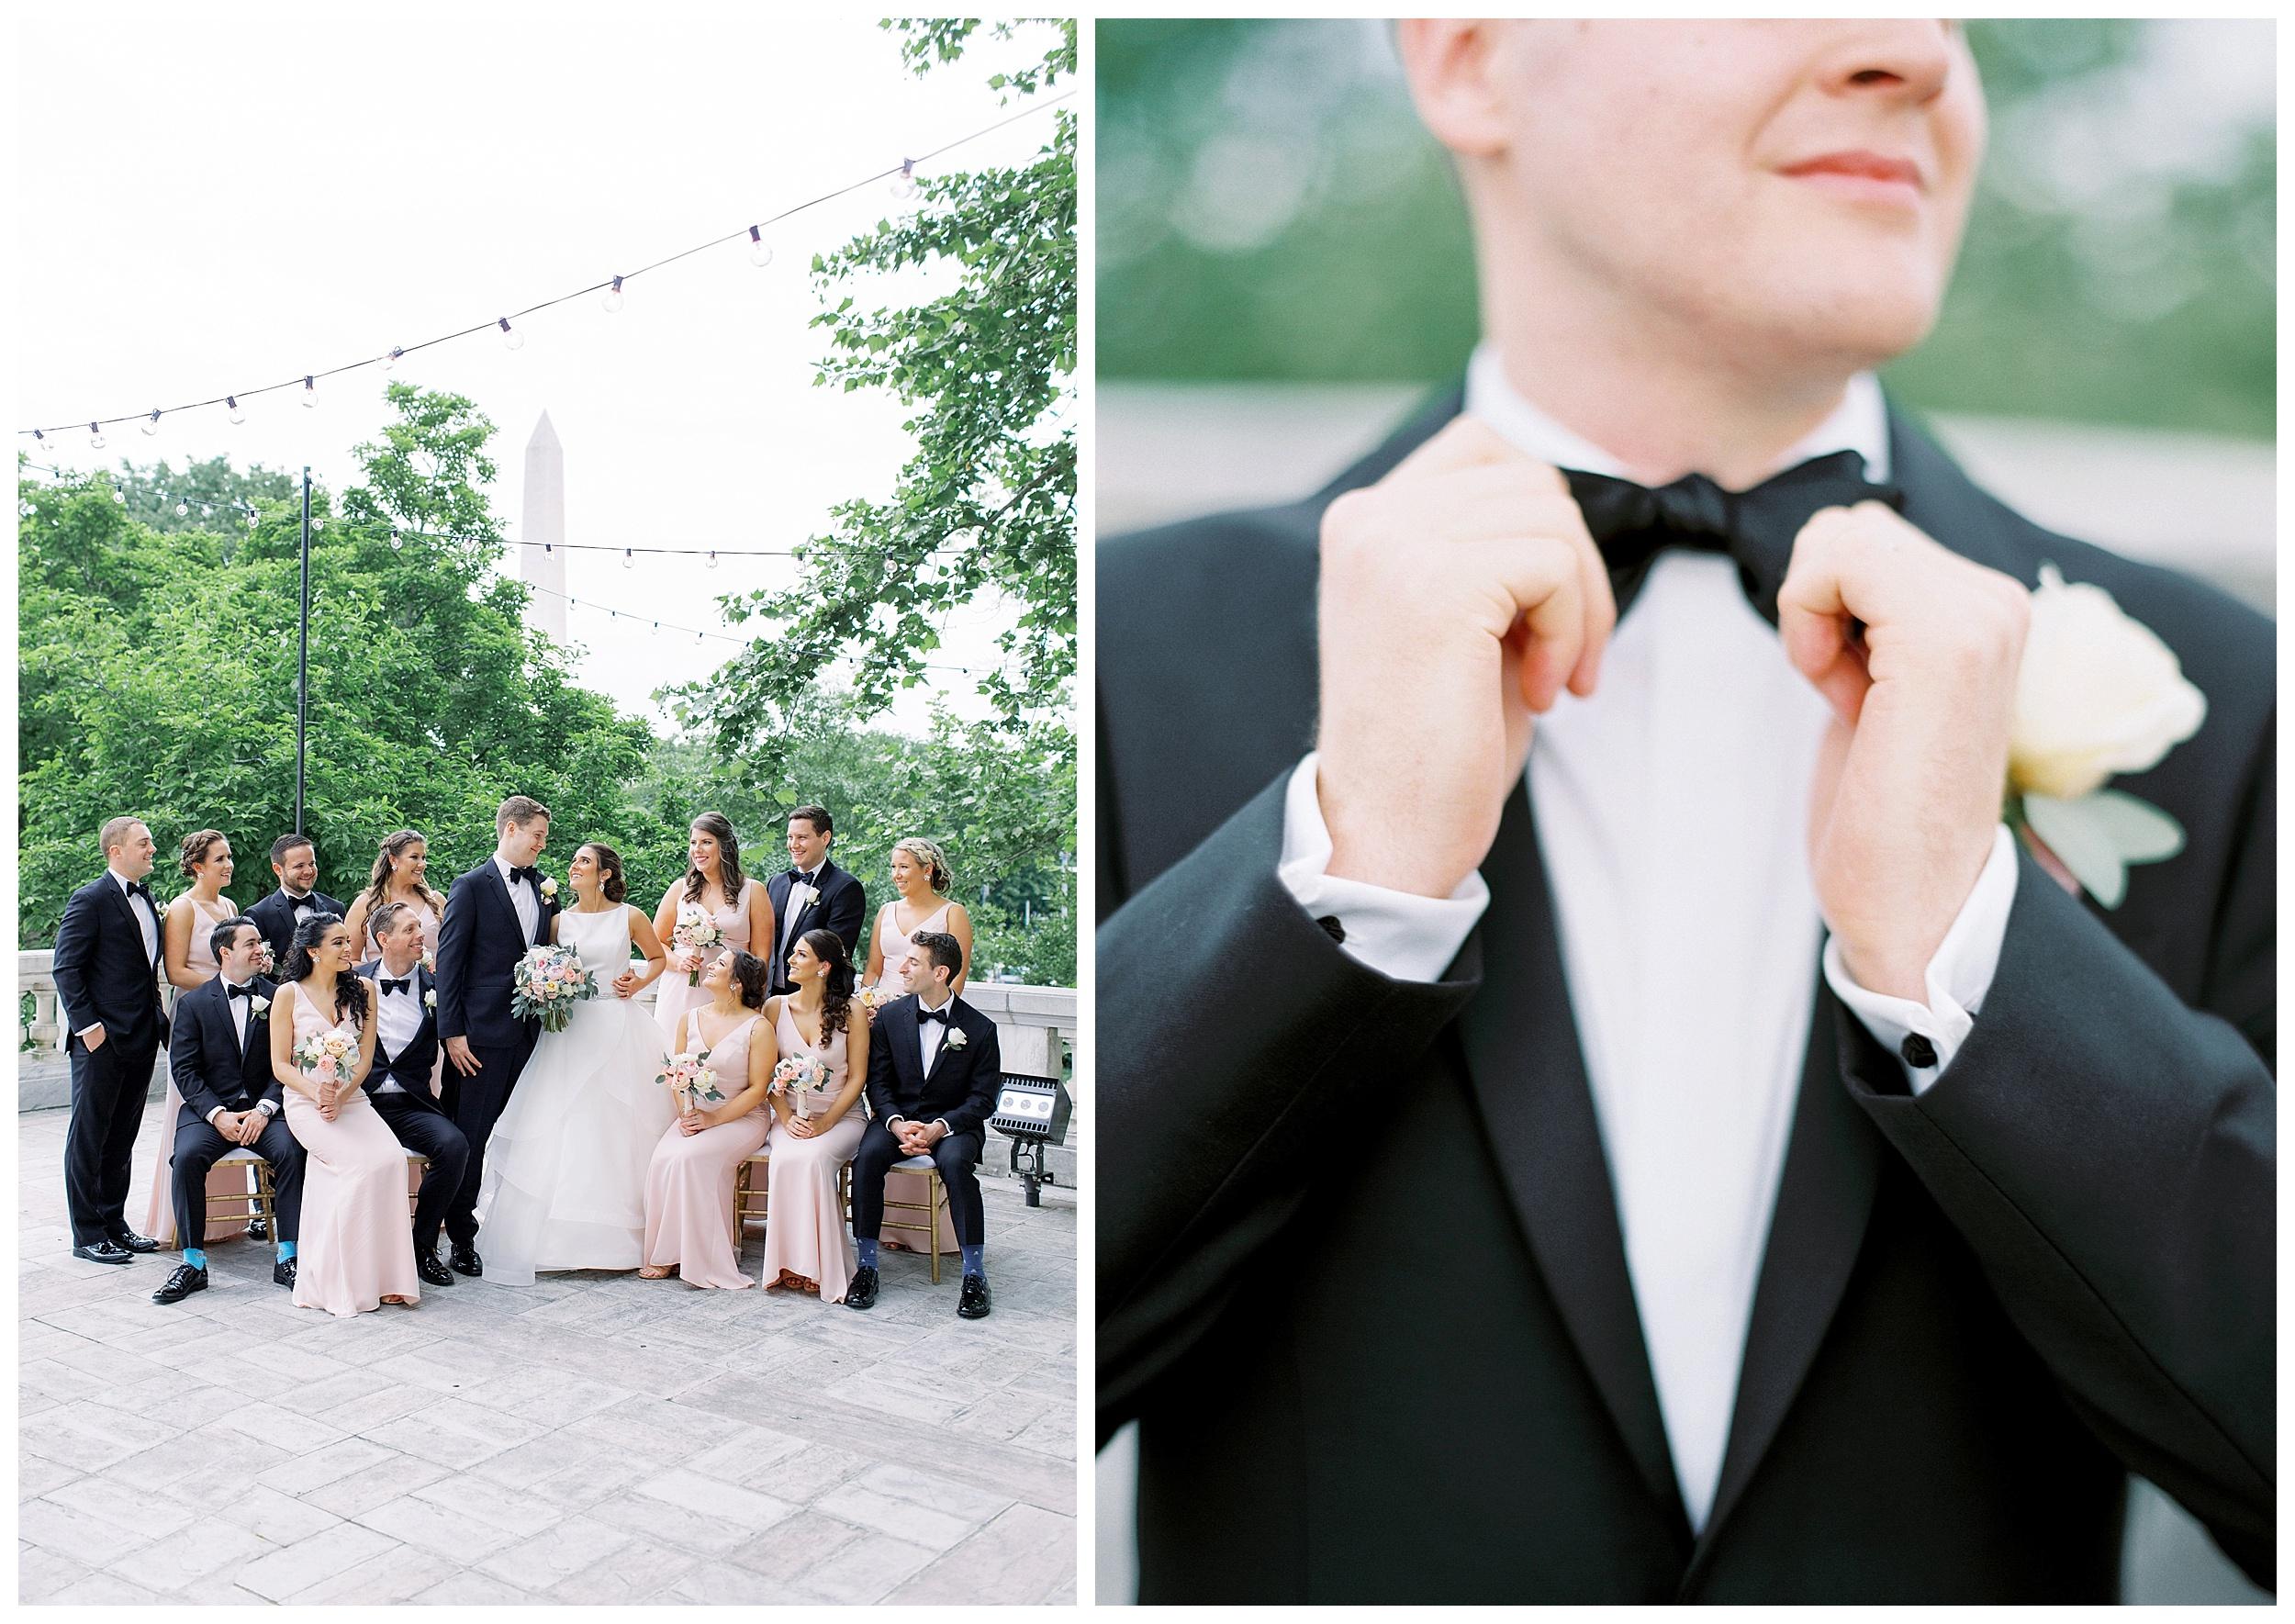 DAR Constitution Hall Wedding Wedding | Daughters of the American Revolution Wedding | District of Columbia Film Wedding Photographer Kir Tuben_0080.jpg